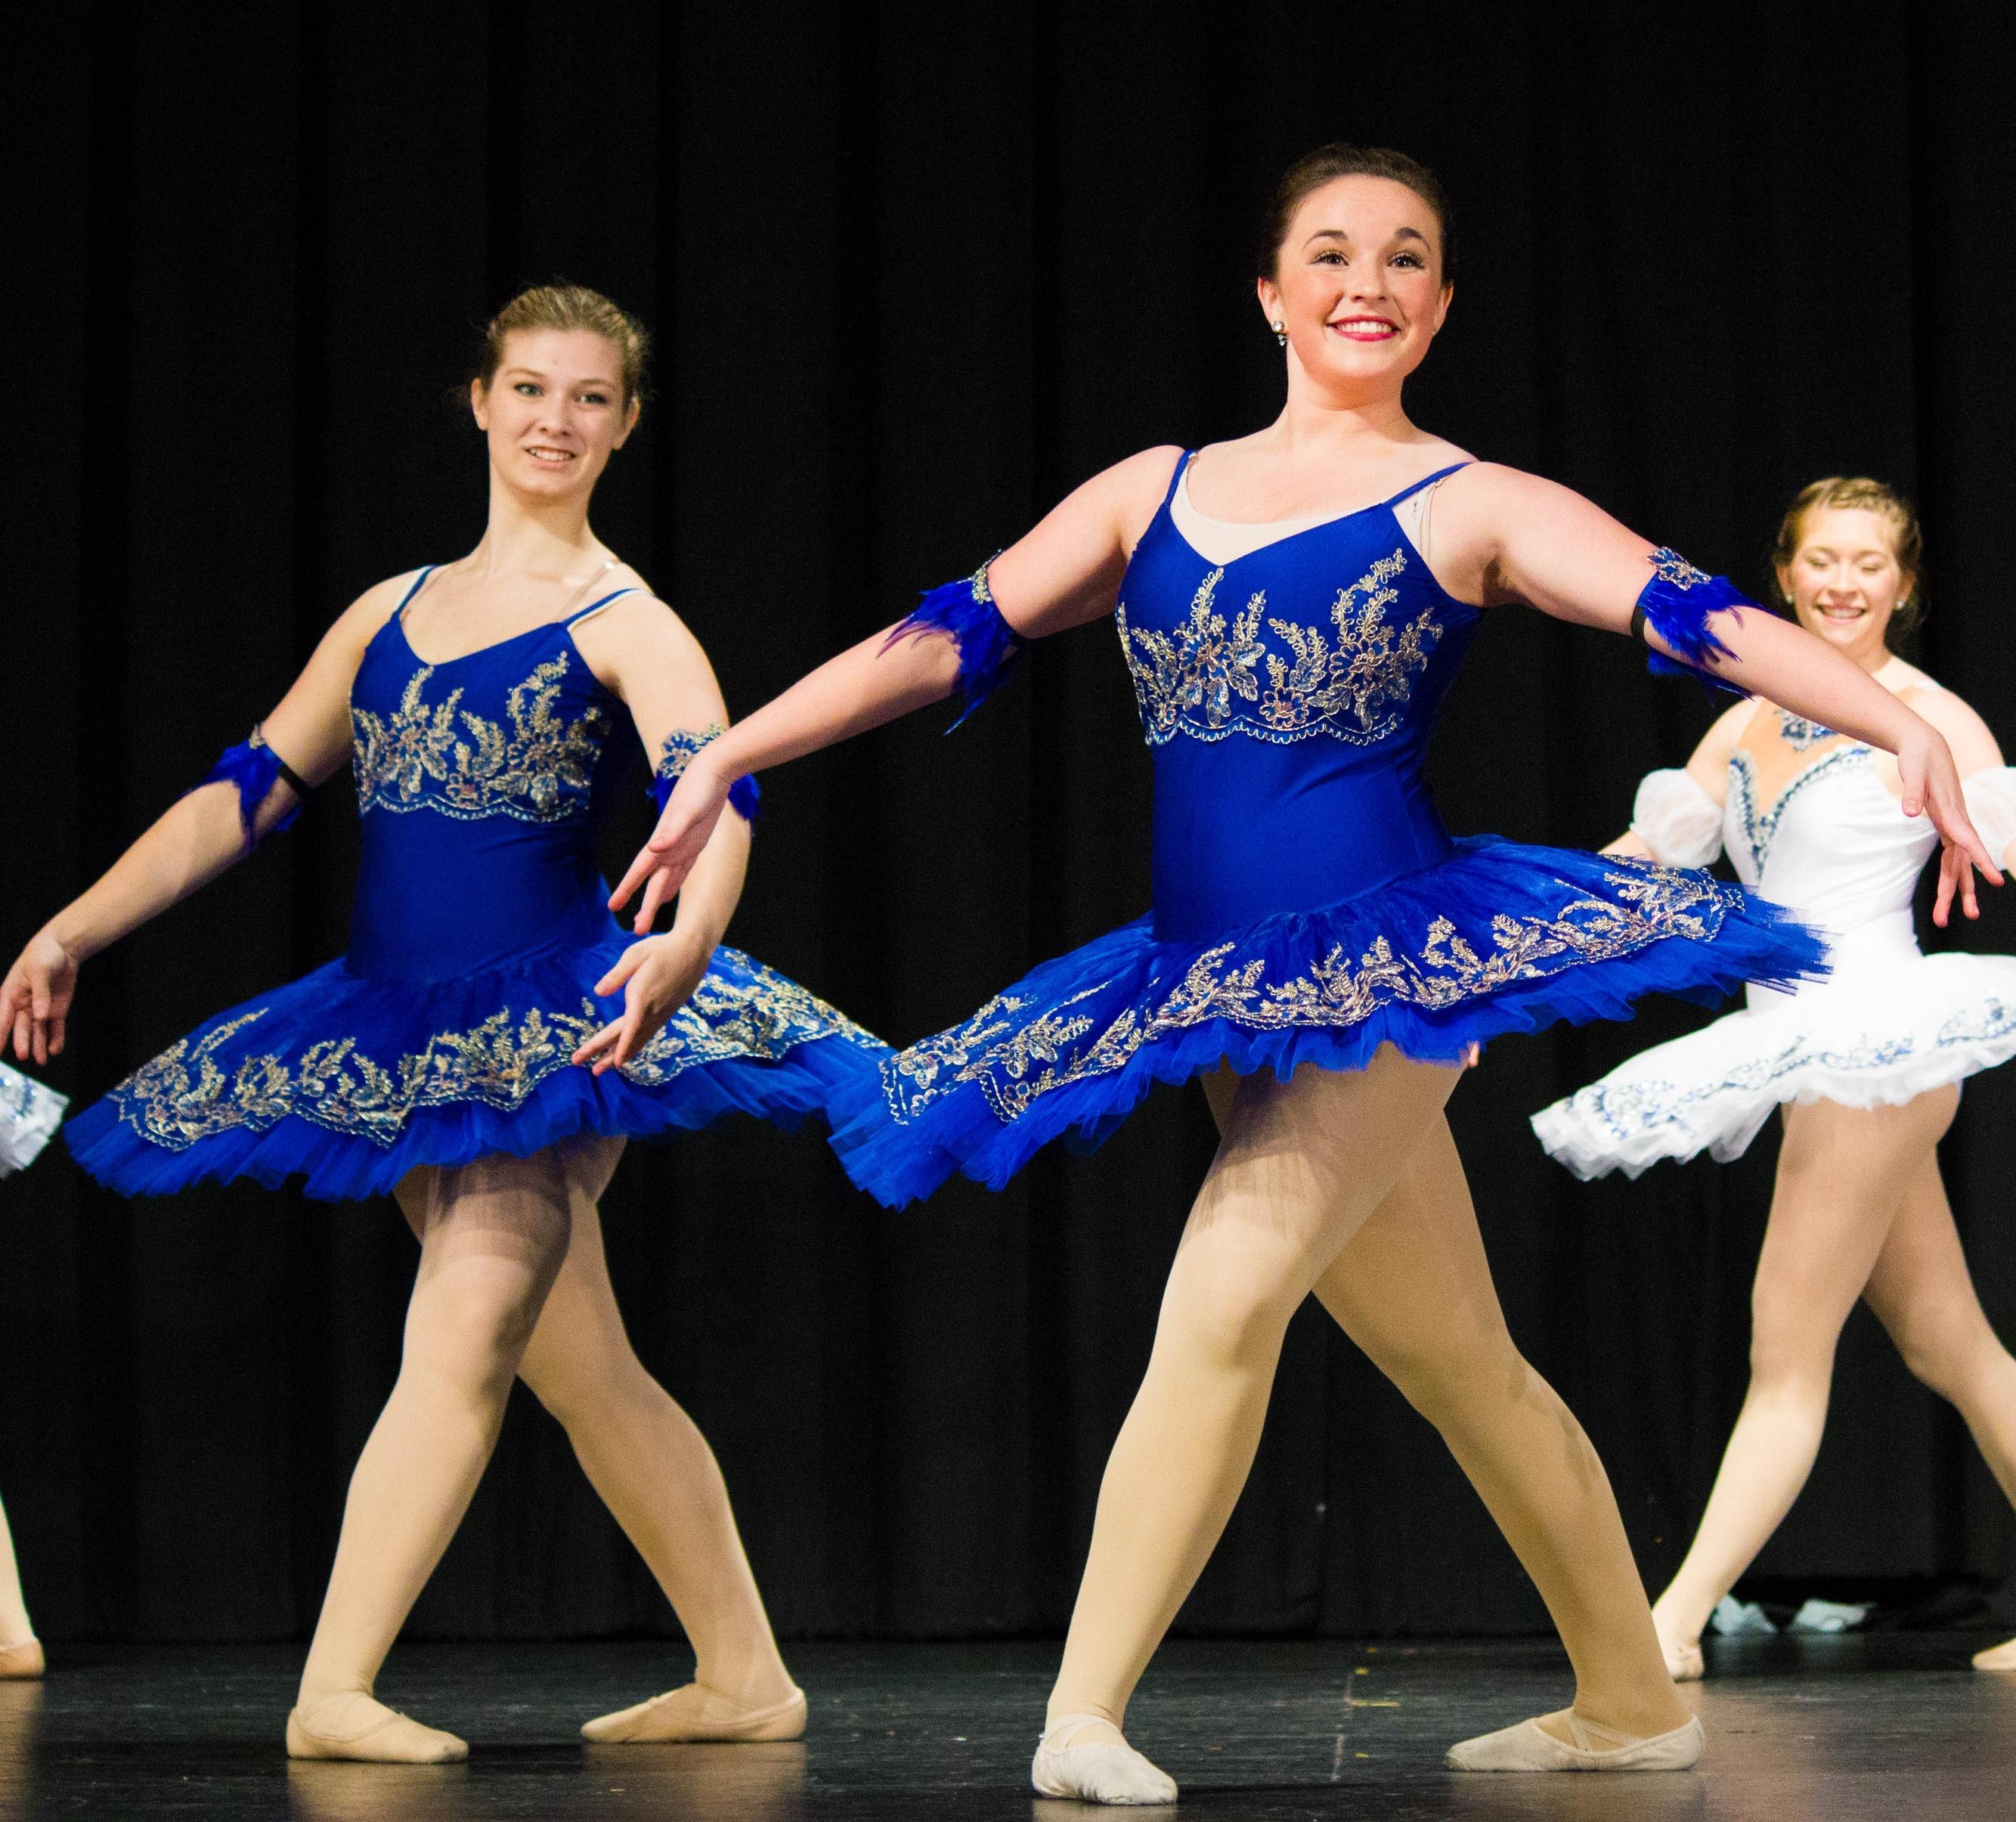 Crystal s School of Dance Dance Artistry